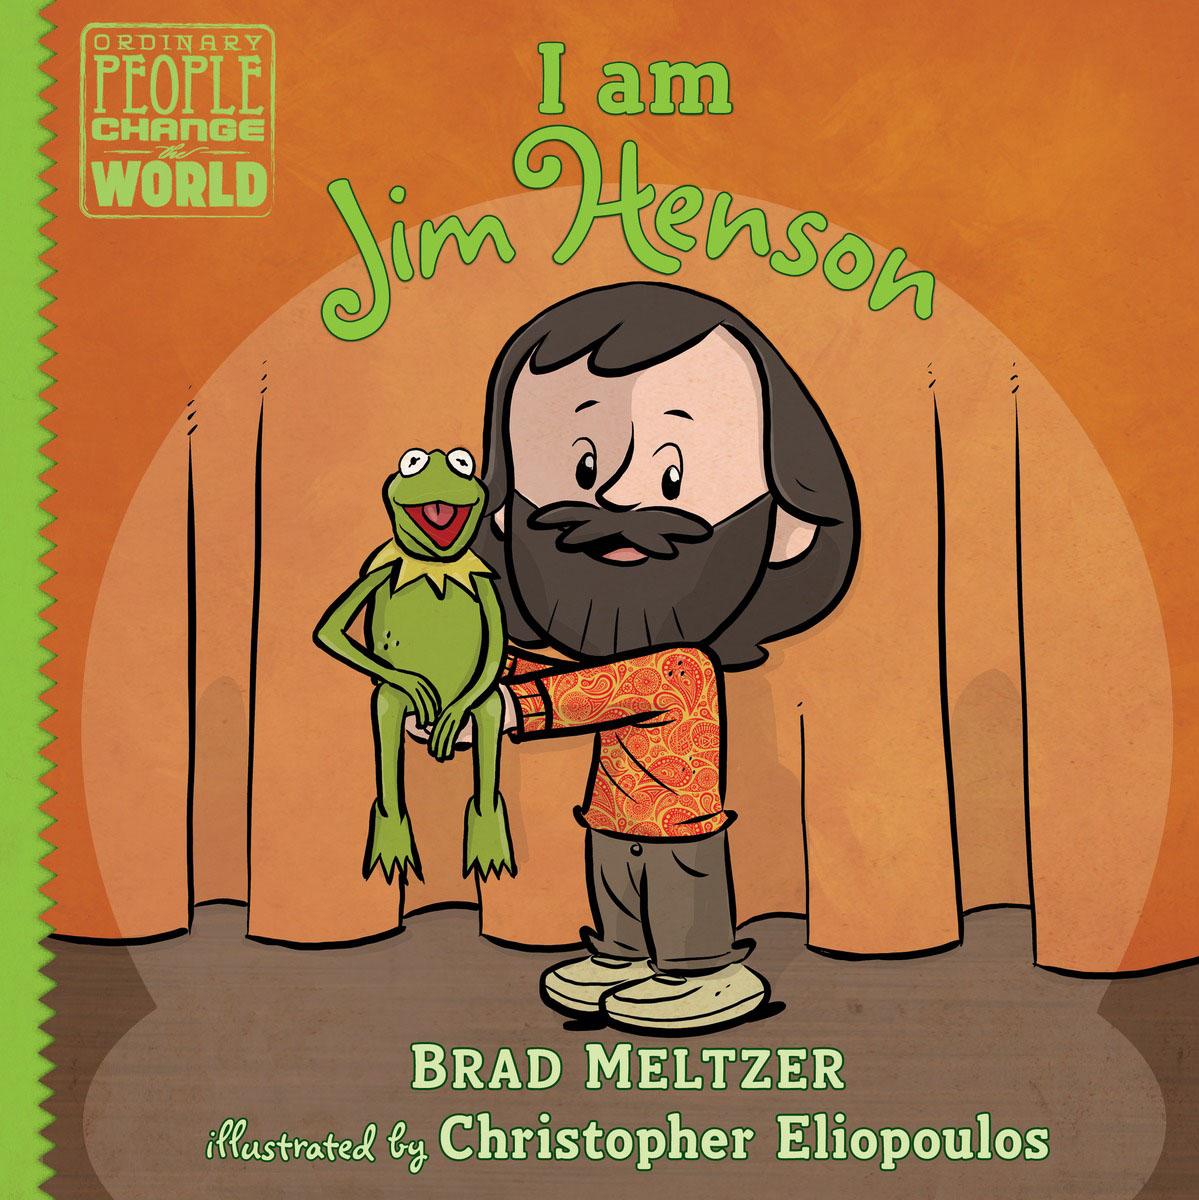 I am Jim Henson jim kokoris the big man of jim beam booker noe and the number one bourbon in the world